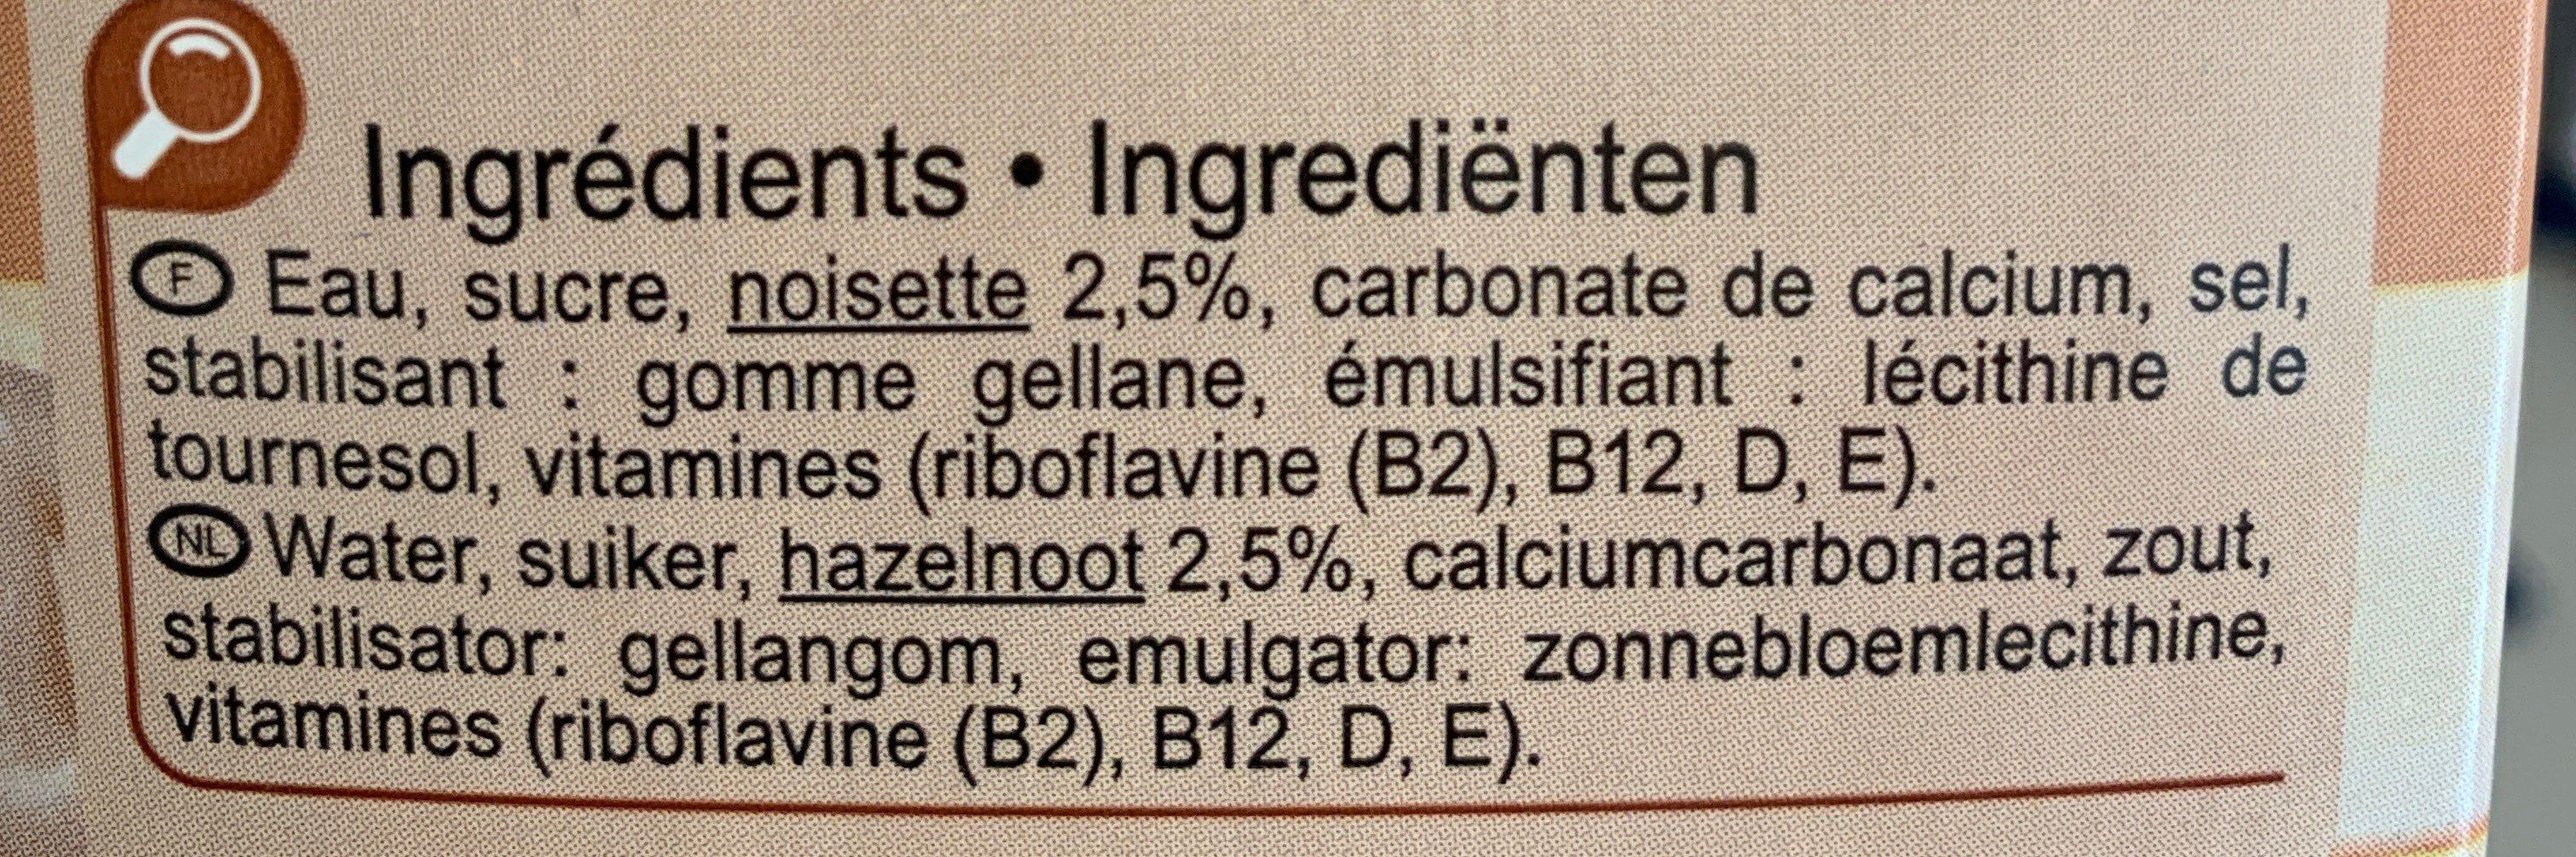 Boisson noisette - Ingredienti - fr